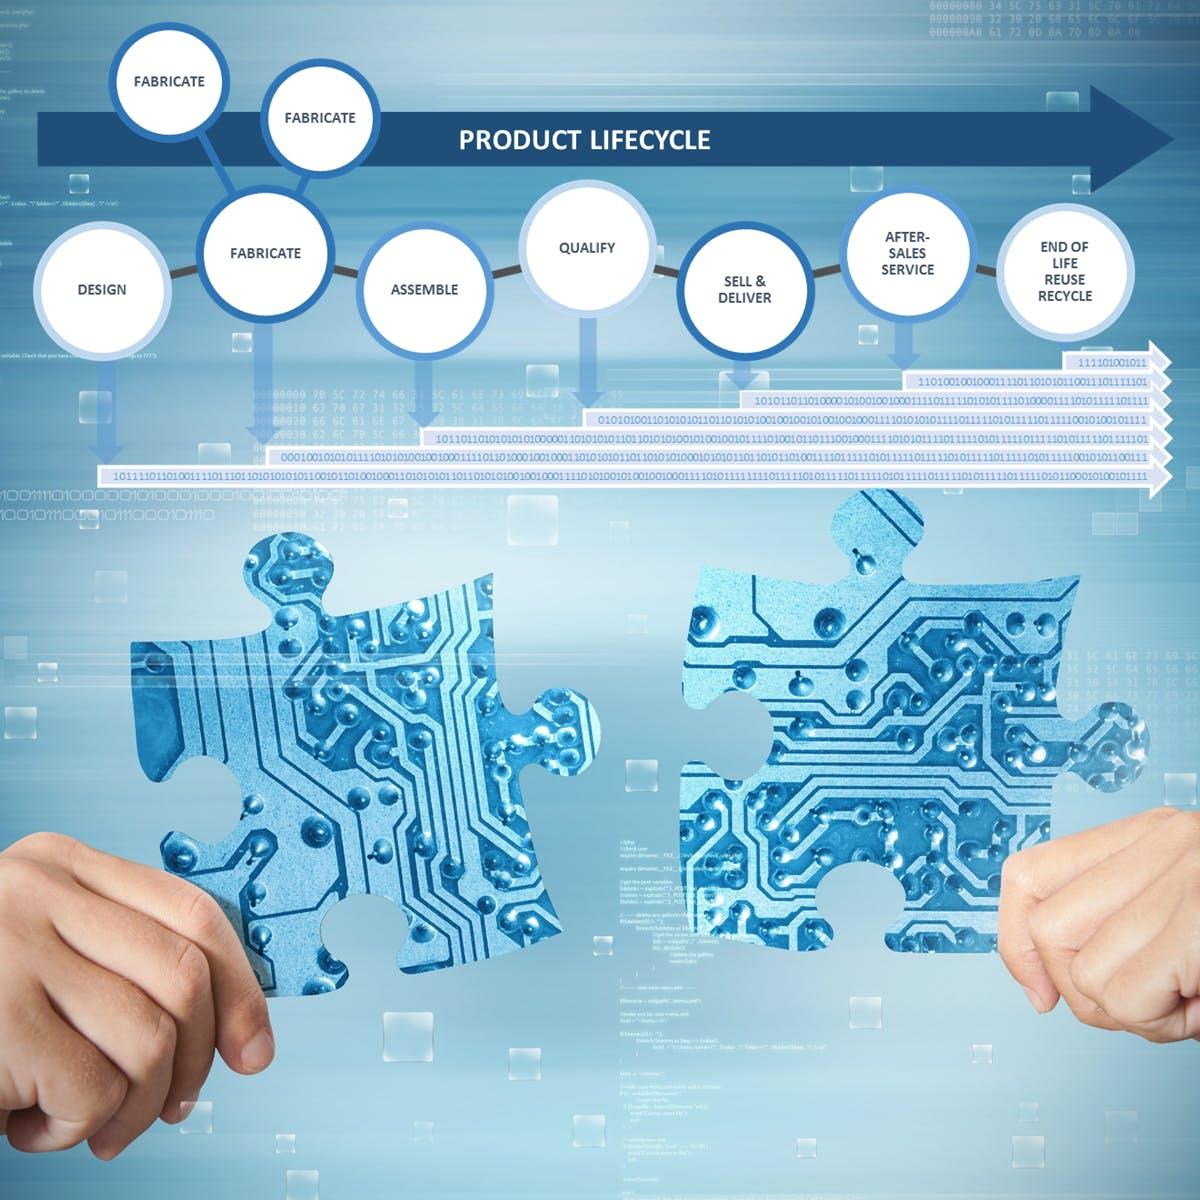 Digital Thread: Components